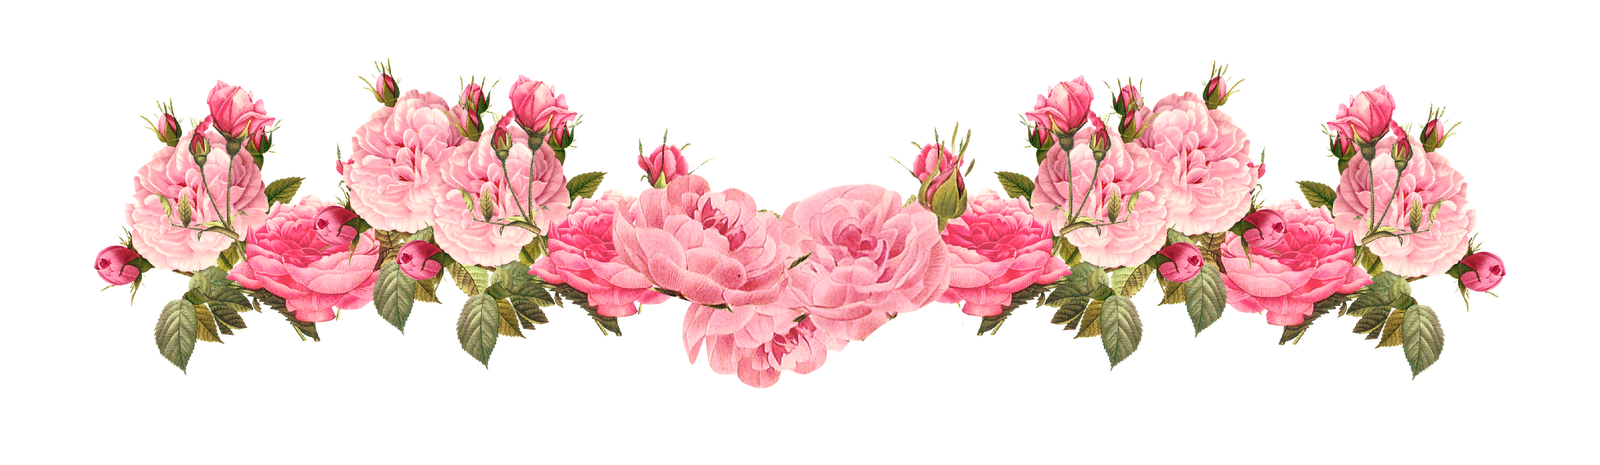 Free Vintage Rose Borders   Vintage Roses Scrapbooking Embellishment